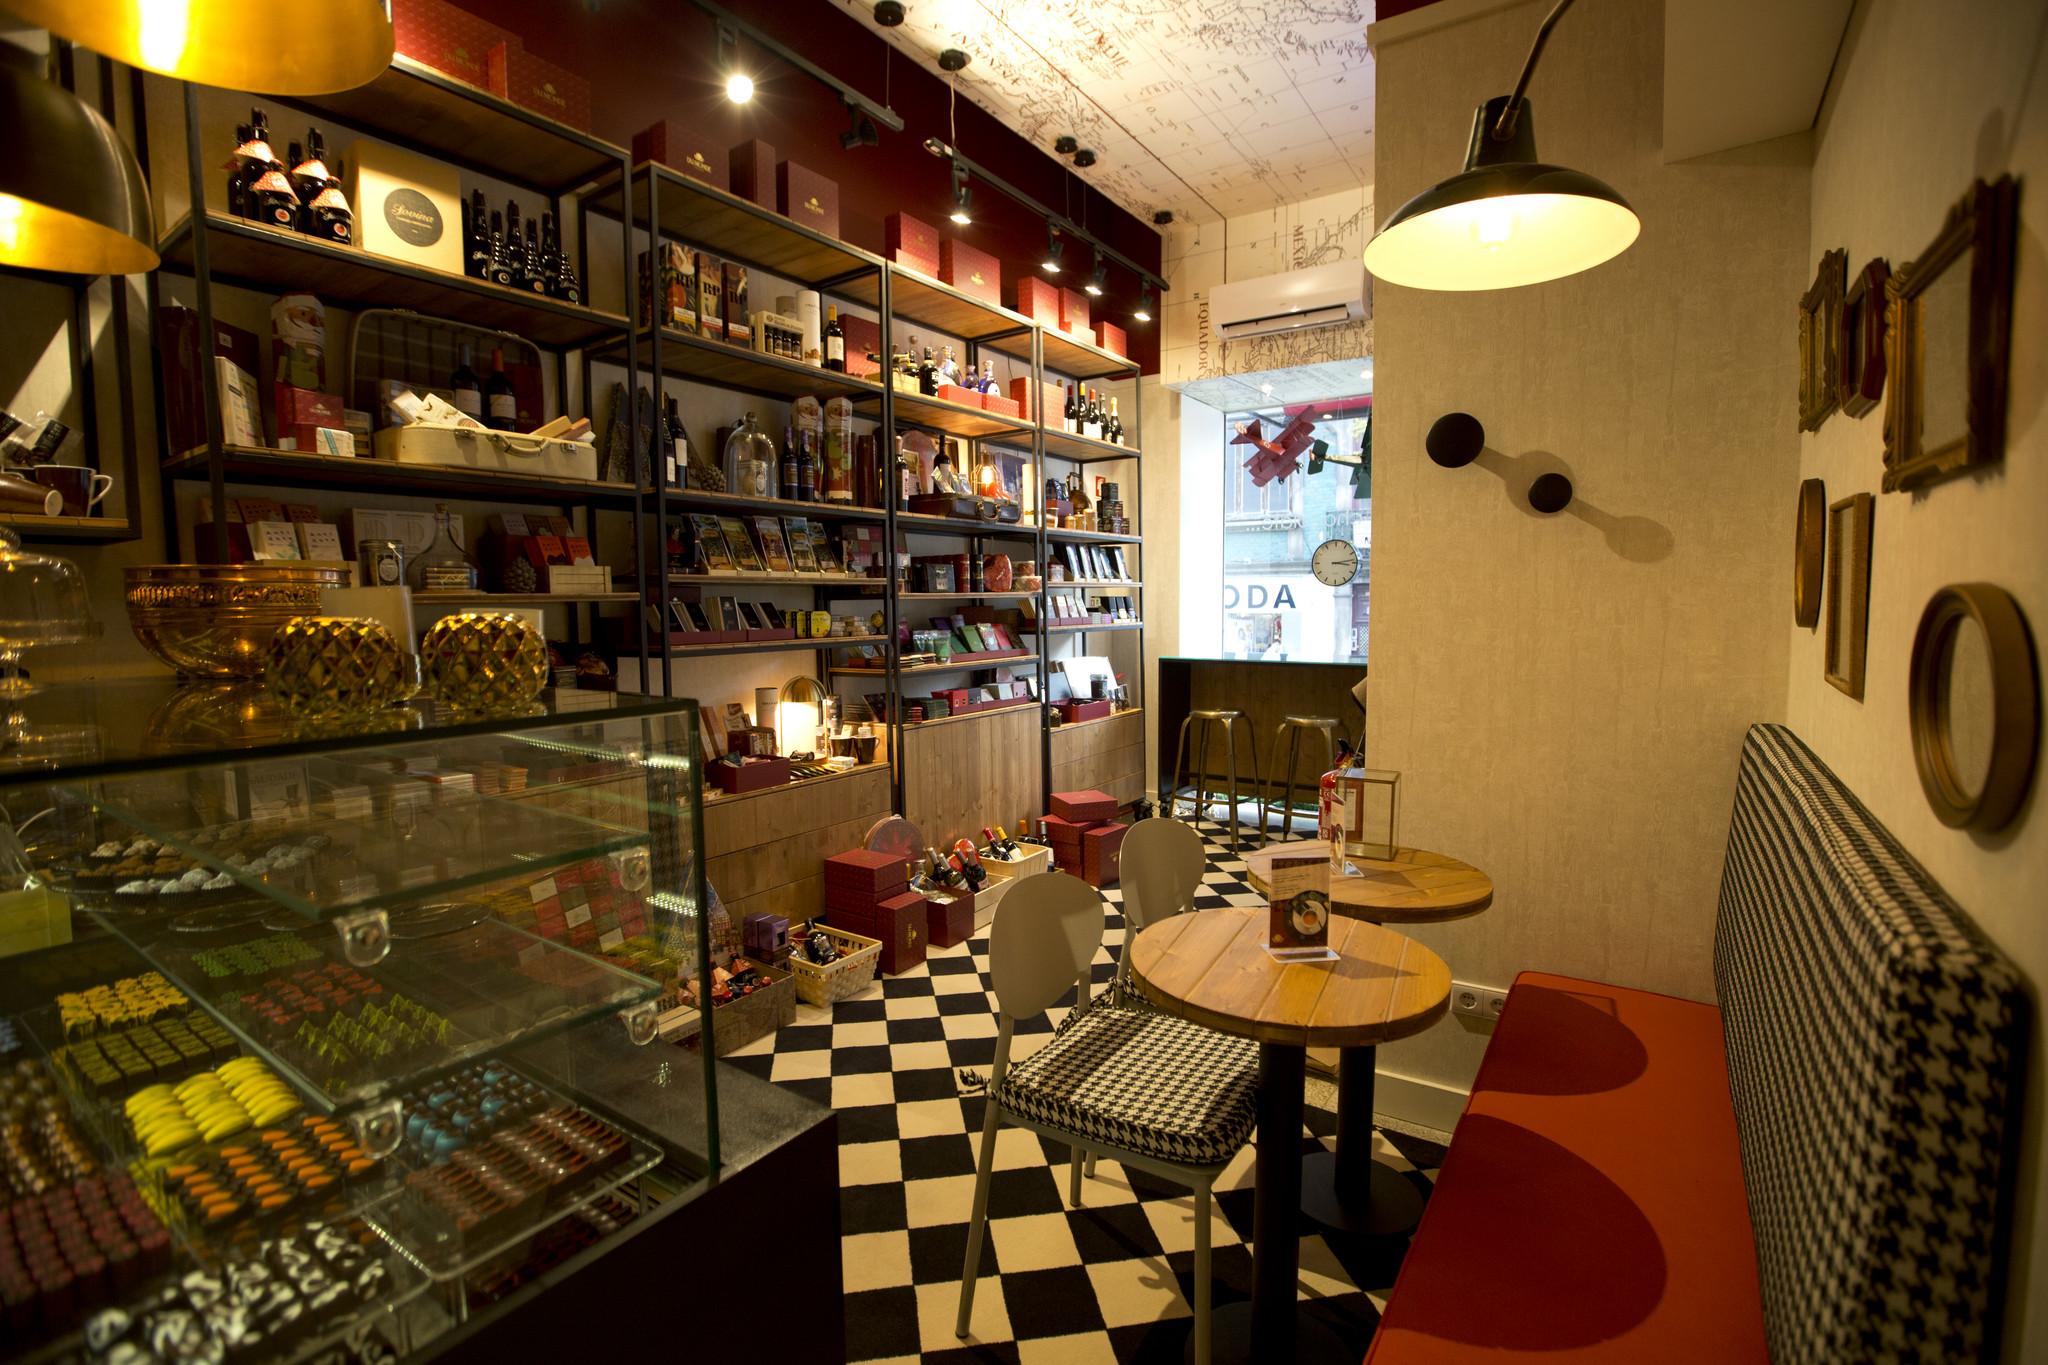 lm-chocolates du monde 03-12-15-06